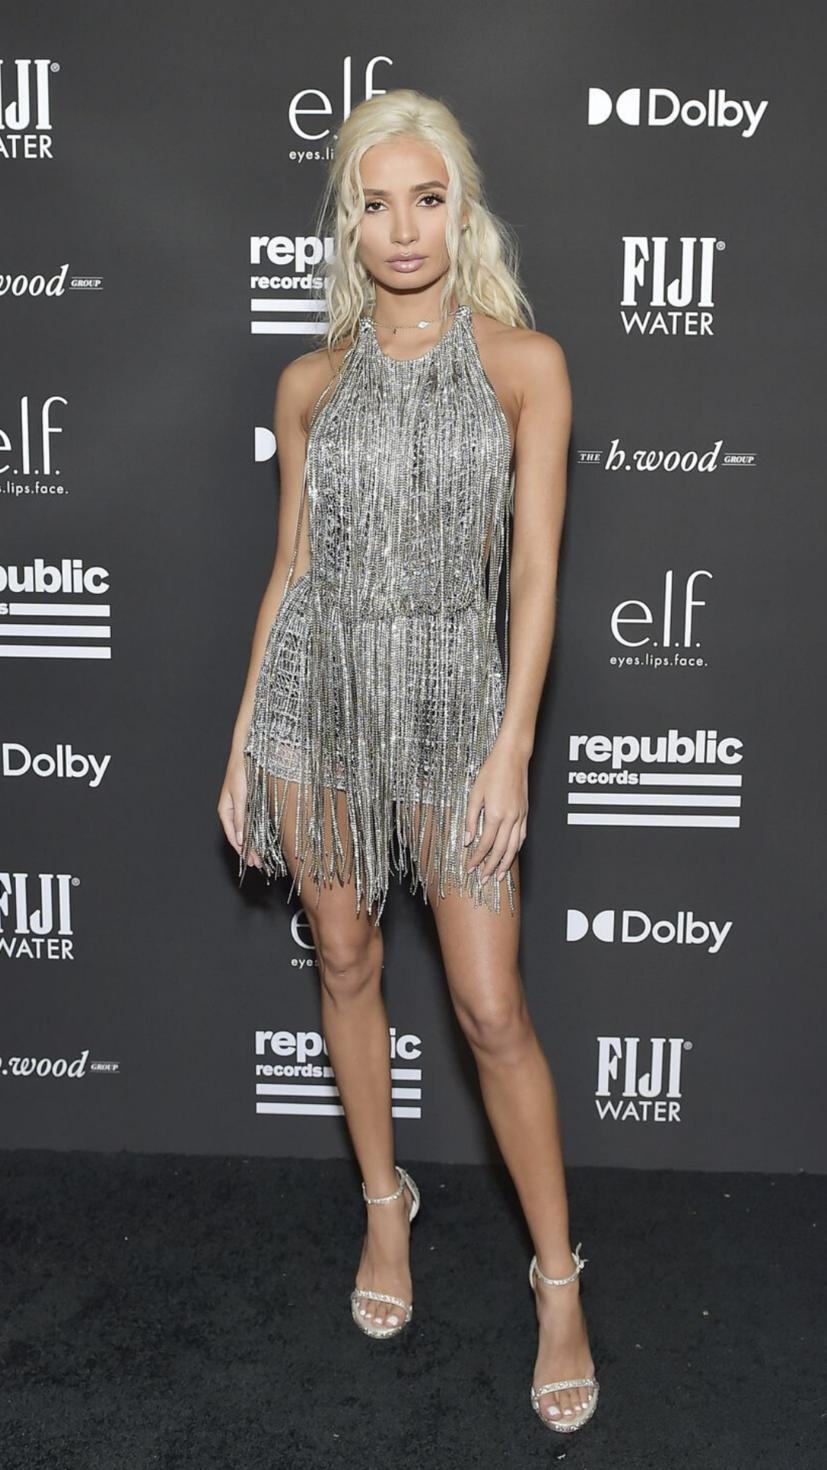 Pia Mia stays put in her Grammys dress from Julian Macdonald